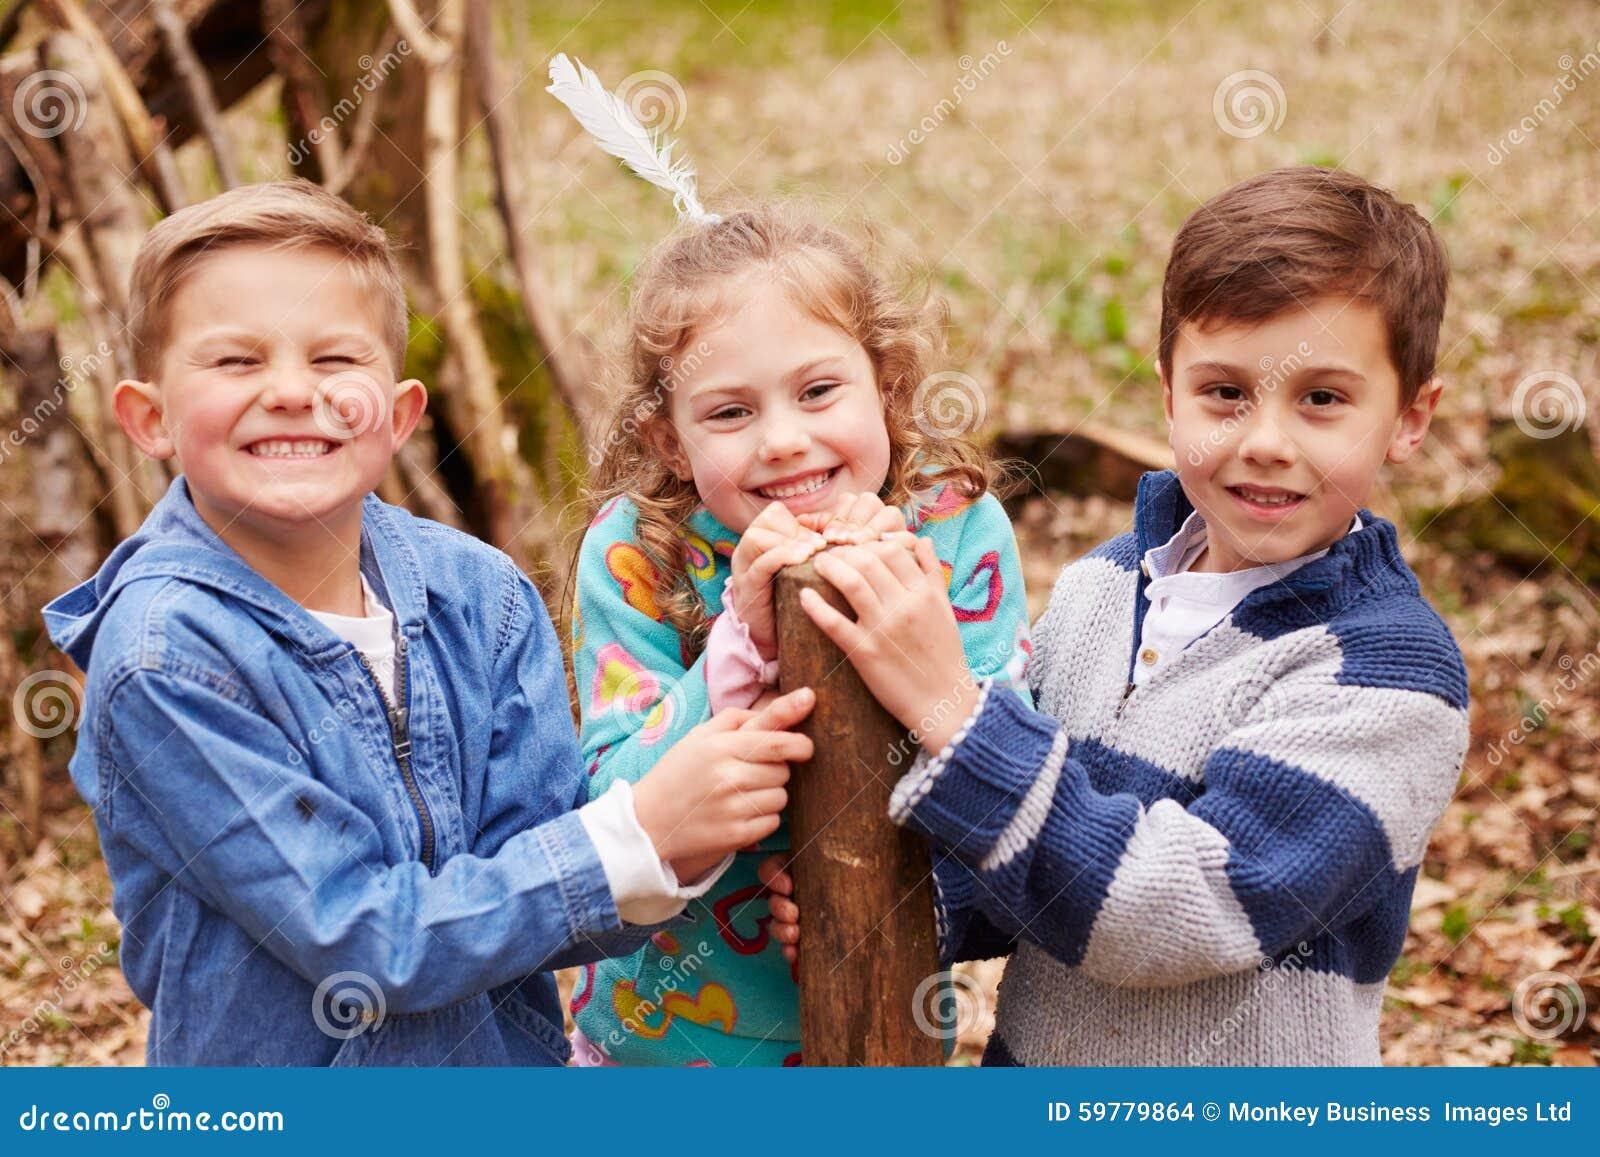 Children Building Camp In Forest Together